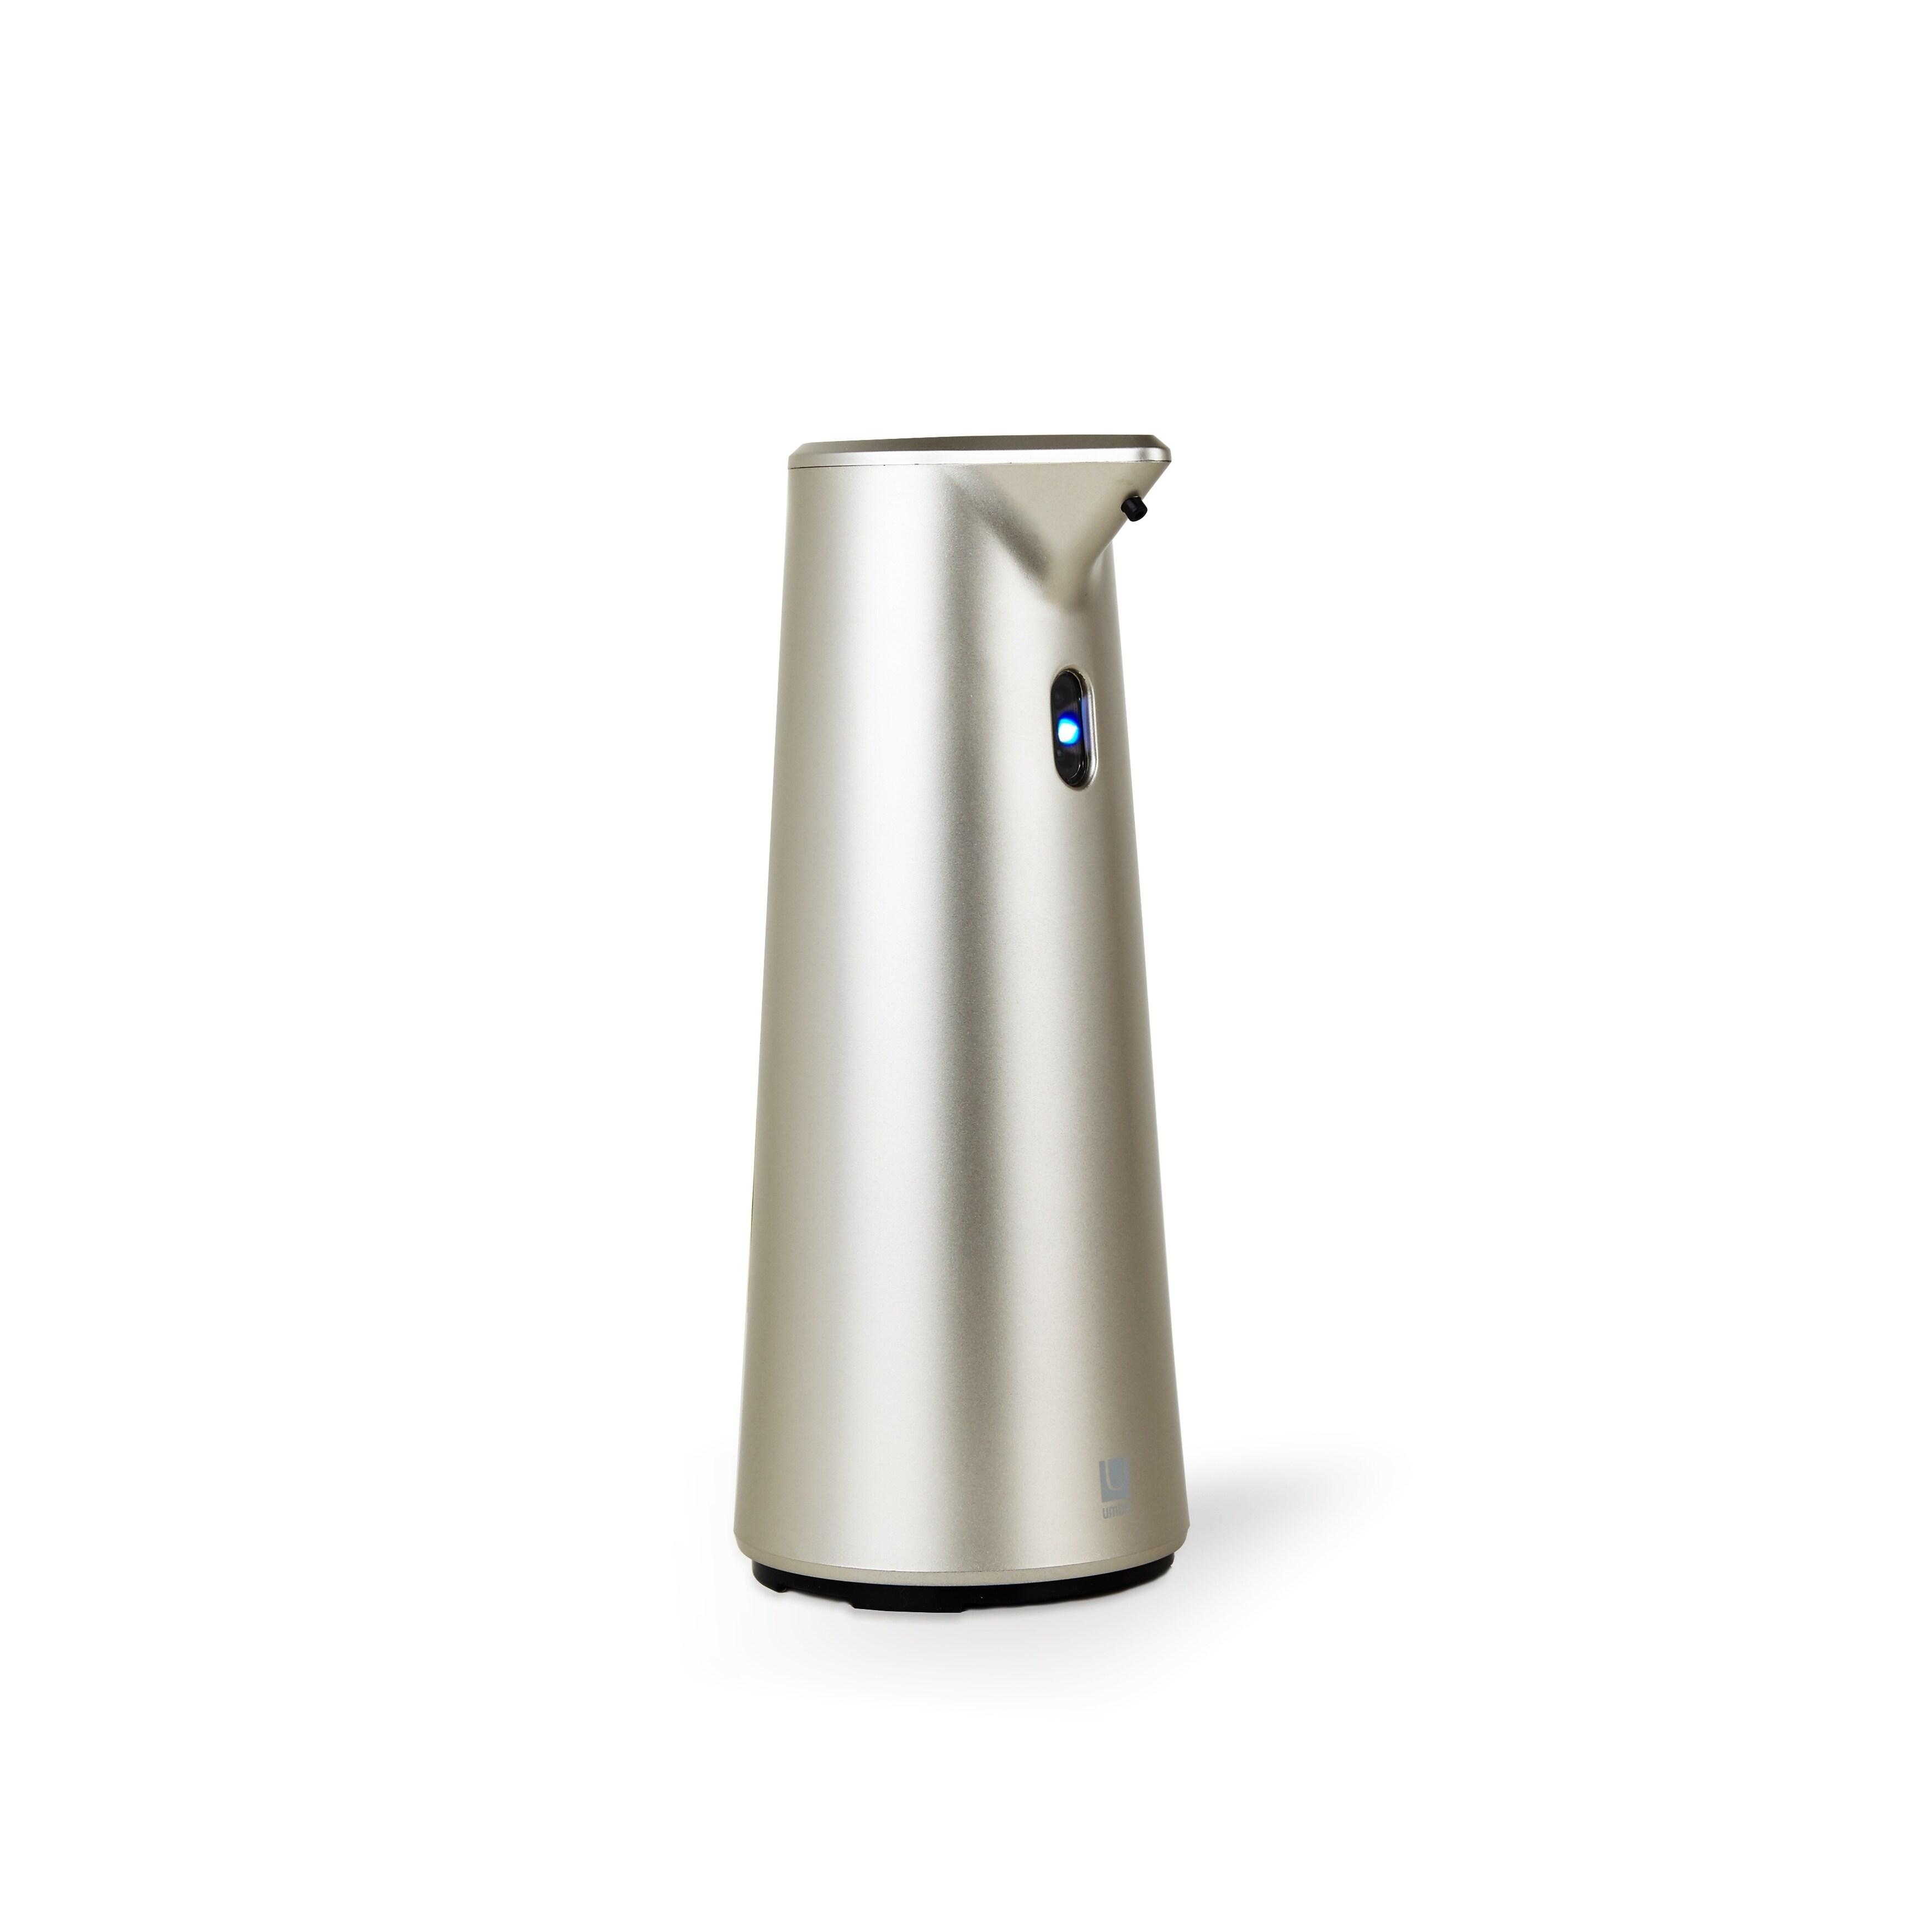 Umbra Finch Handsfree Compact Sensor Soap or Hand Sanitiz...